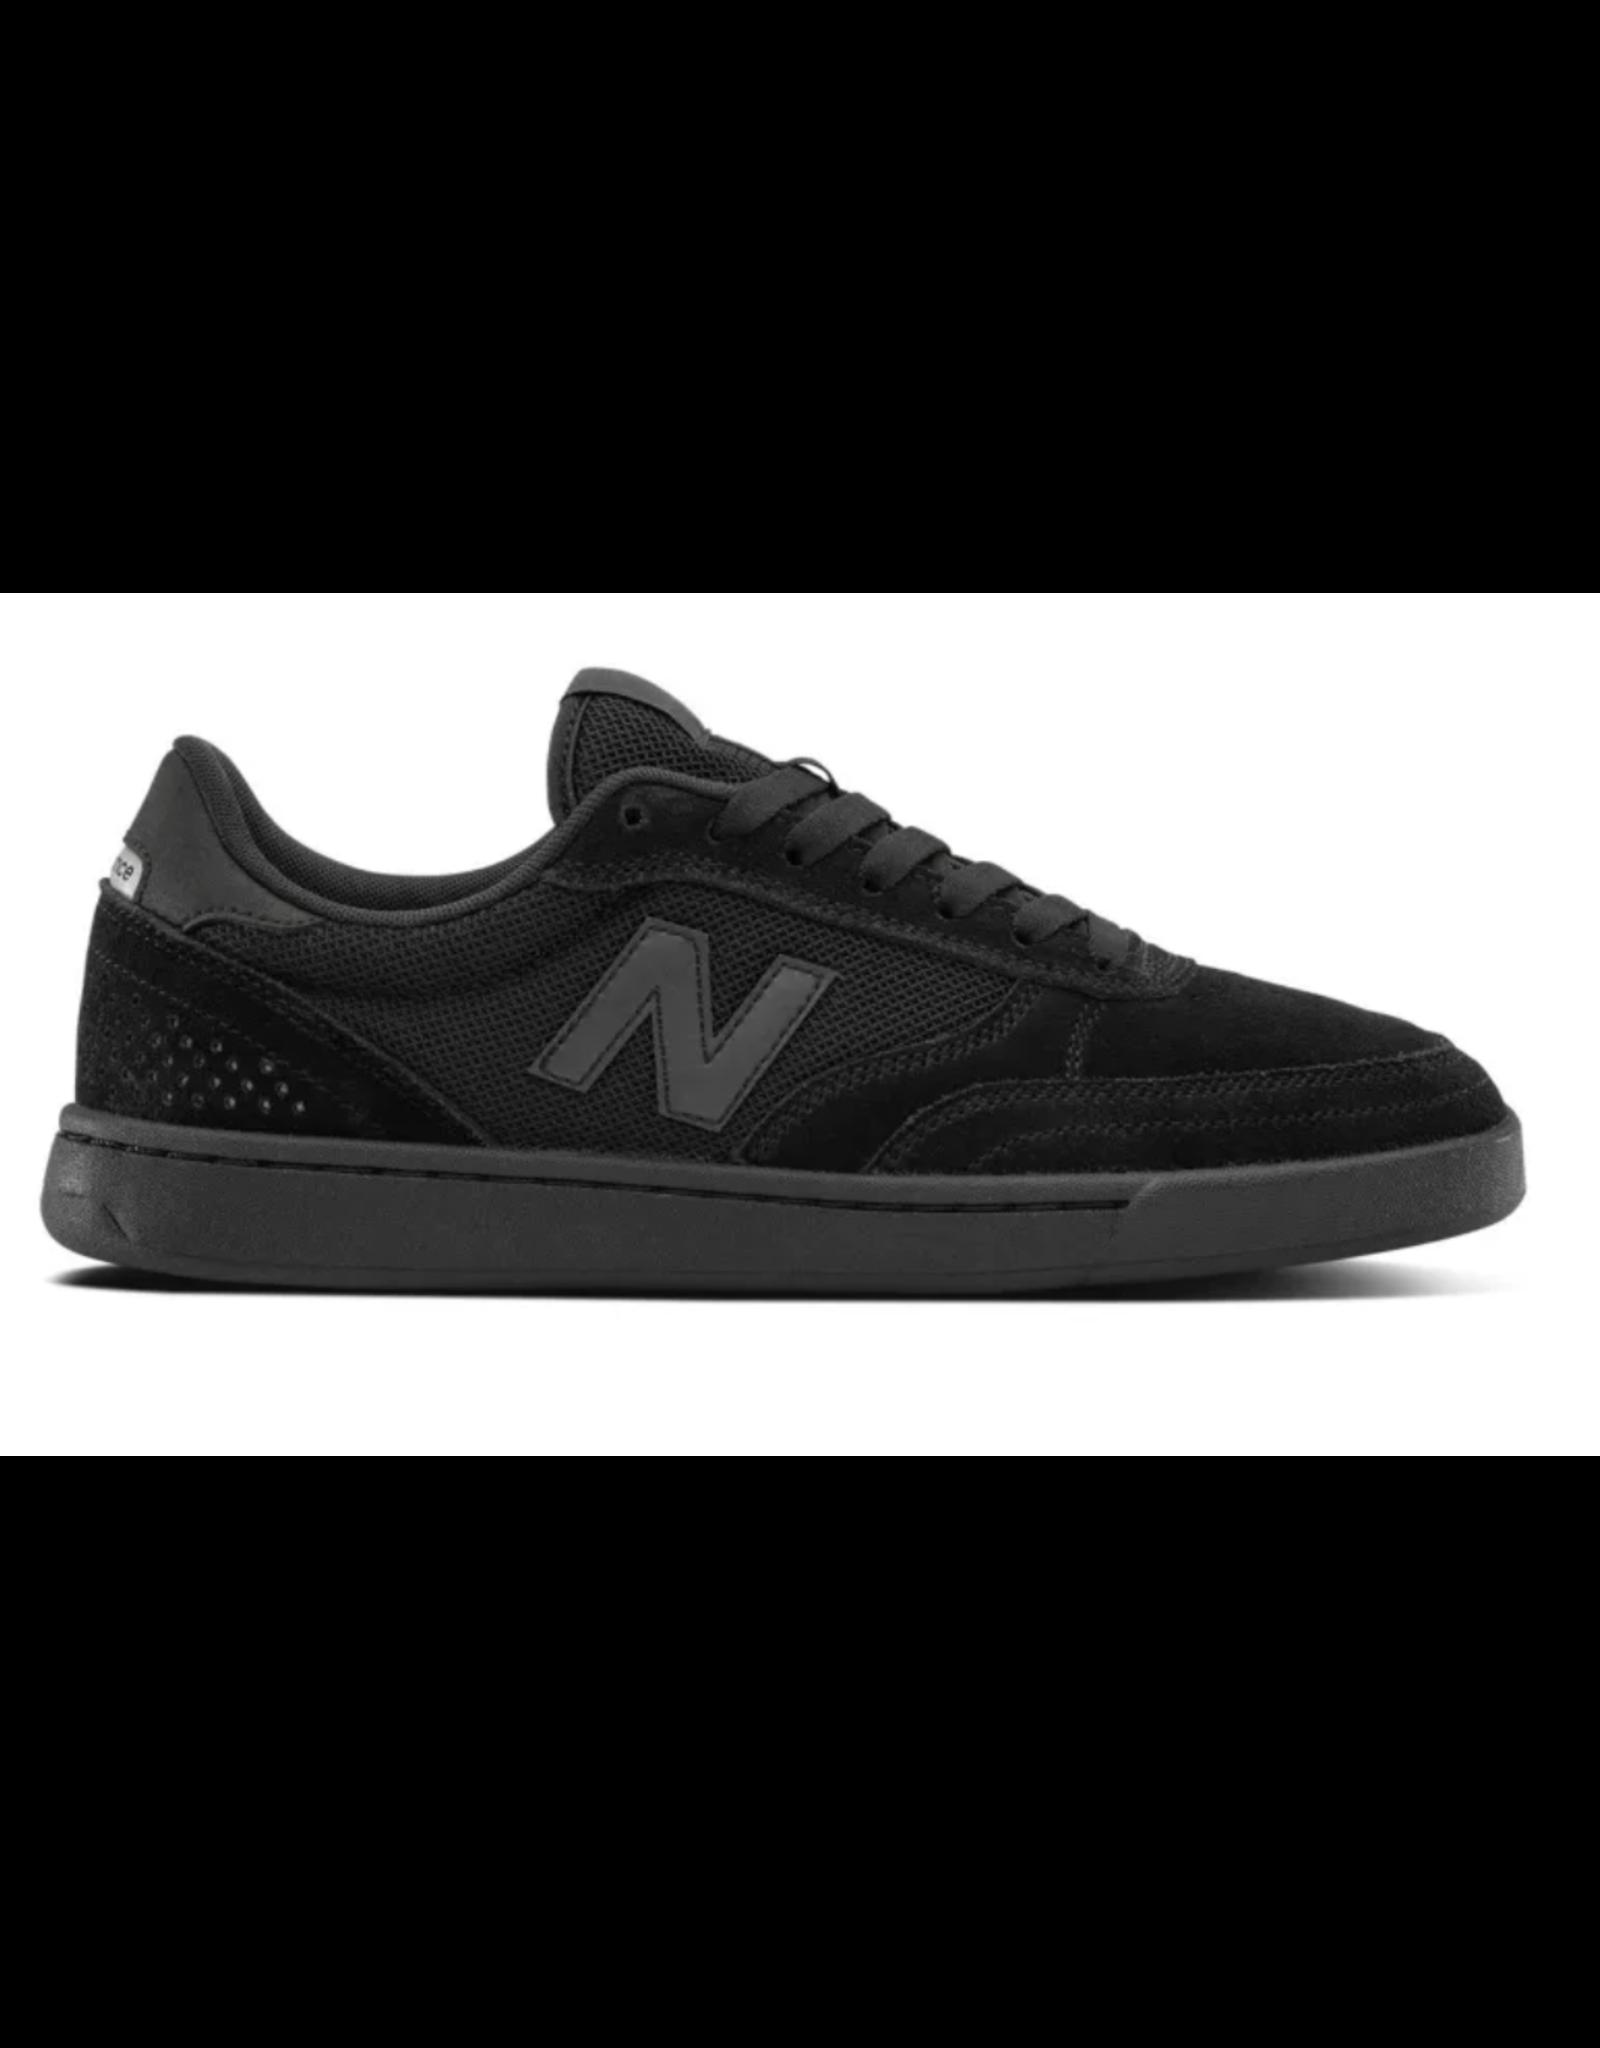 New Balance Numeric 440 - Black